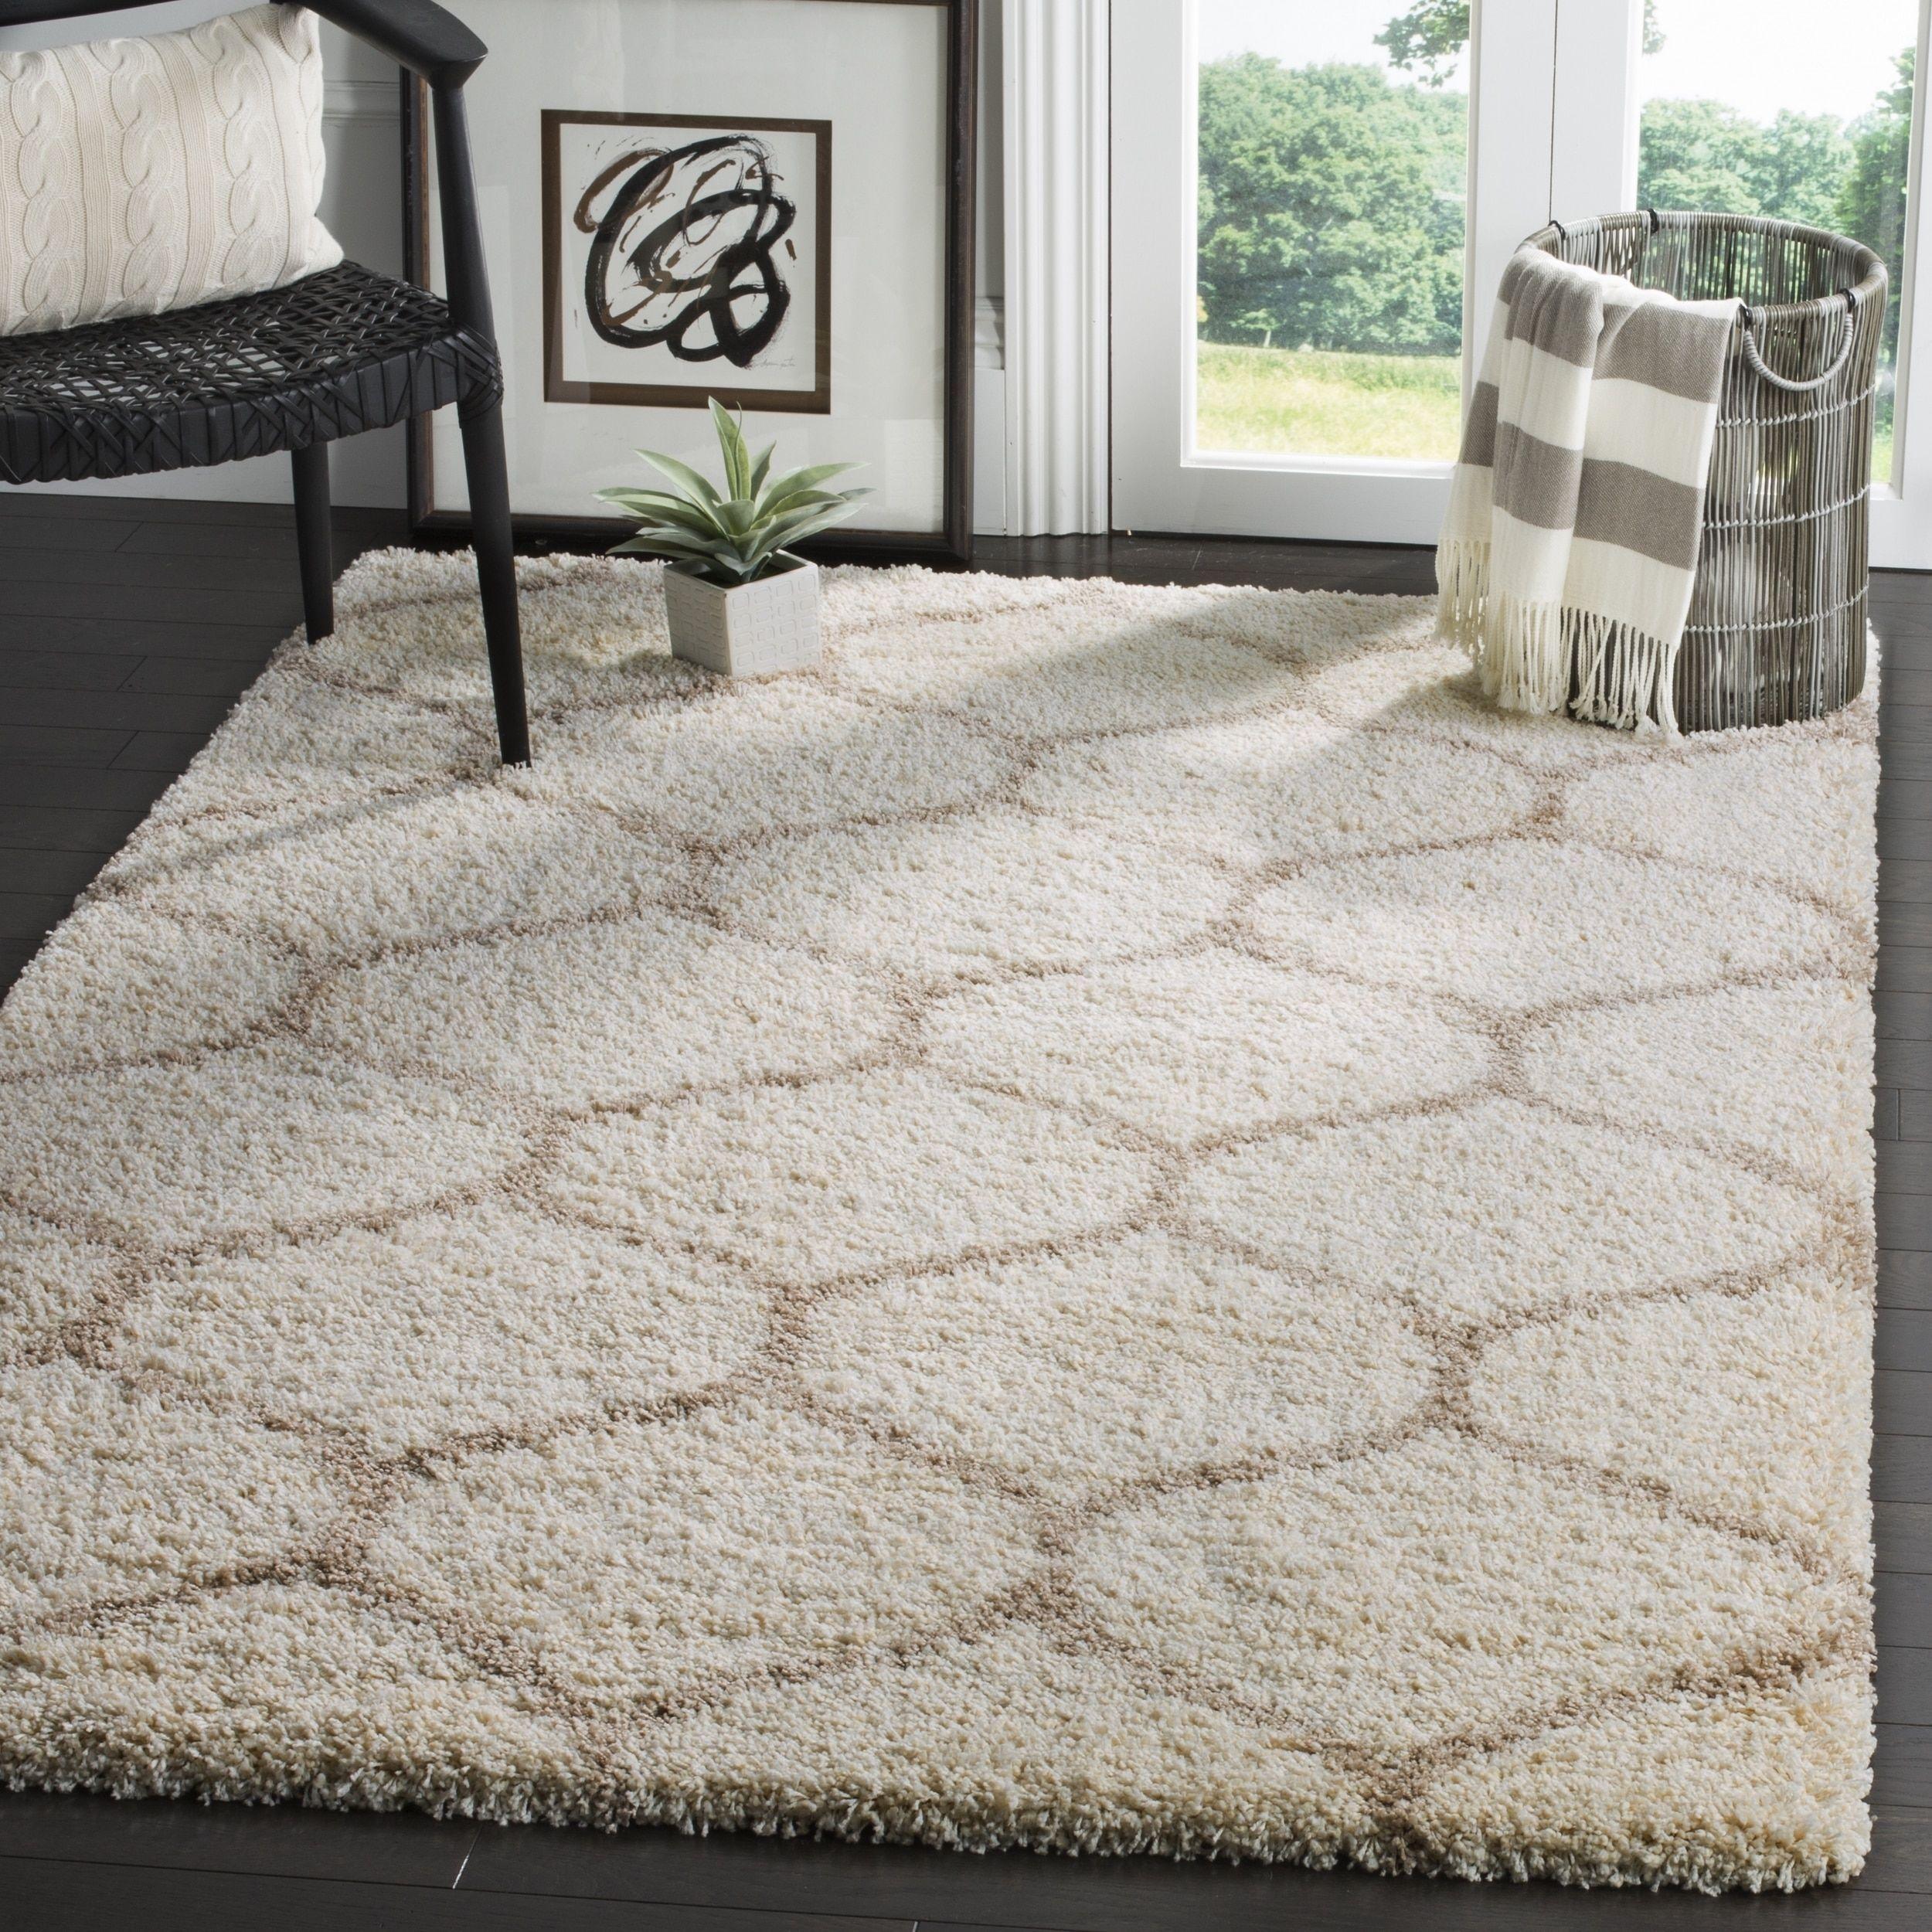 rug for living room size%0A Safavieh Hudson Shag Ivory  Beige Area Rug    u     Square   SGH   D SQ   Size    u      Polypropylene  Geometric